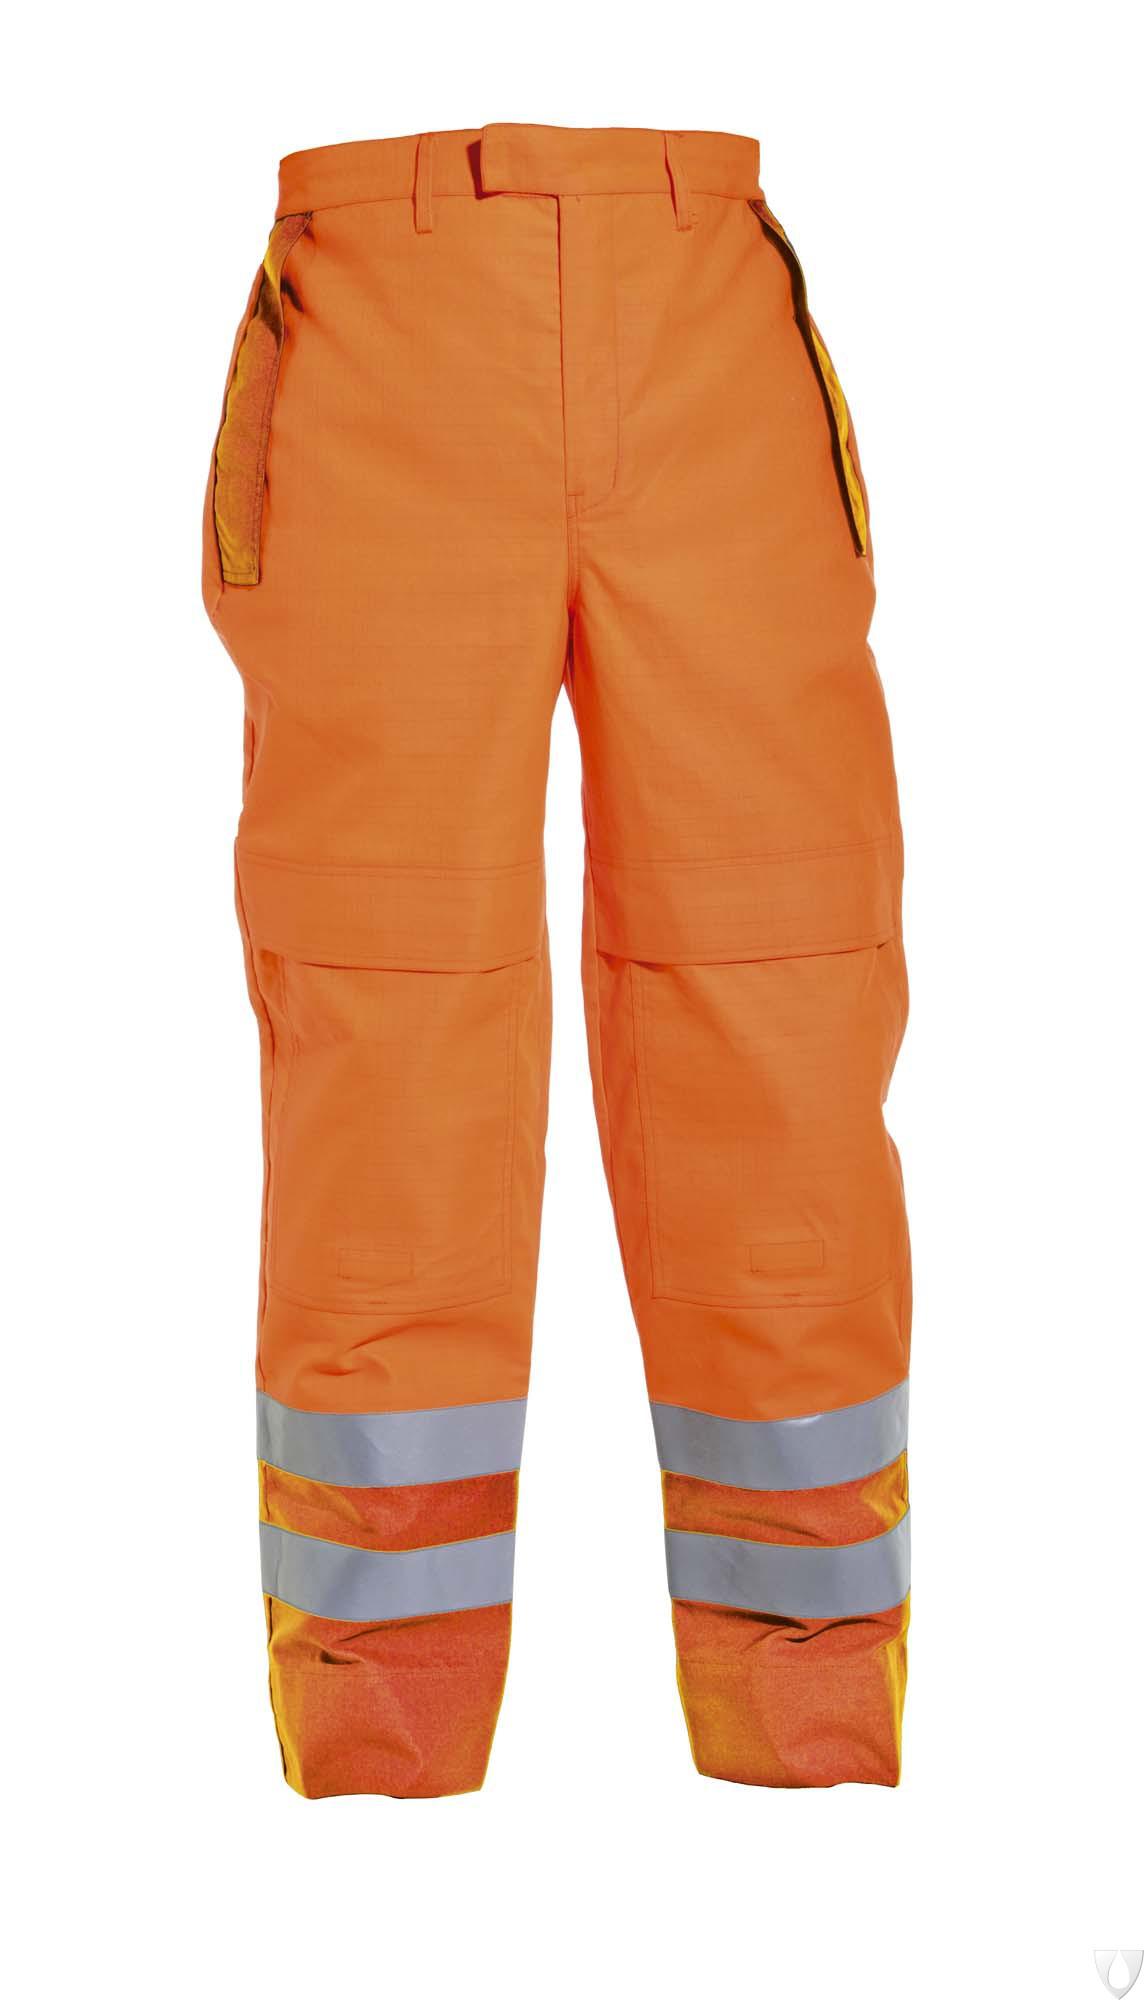 043430 Hydrowear Mainz Werkbroek Atex Oranje